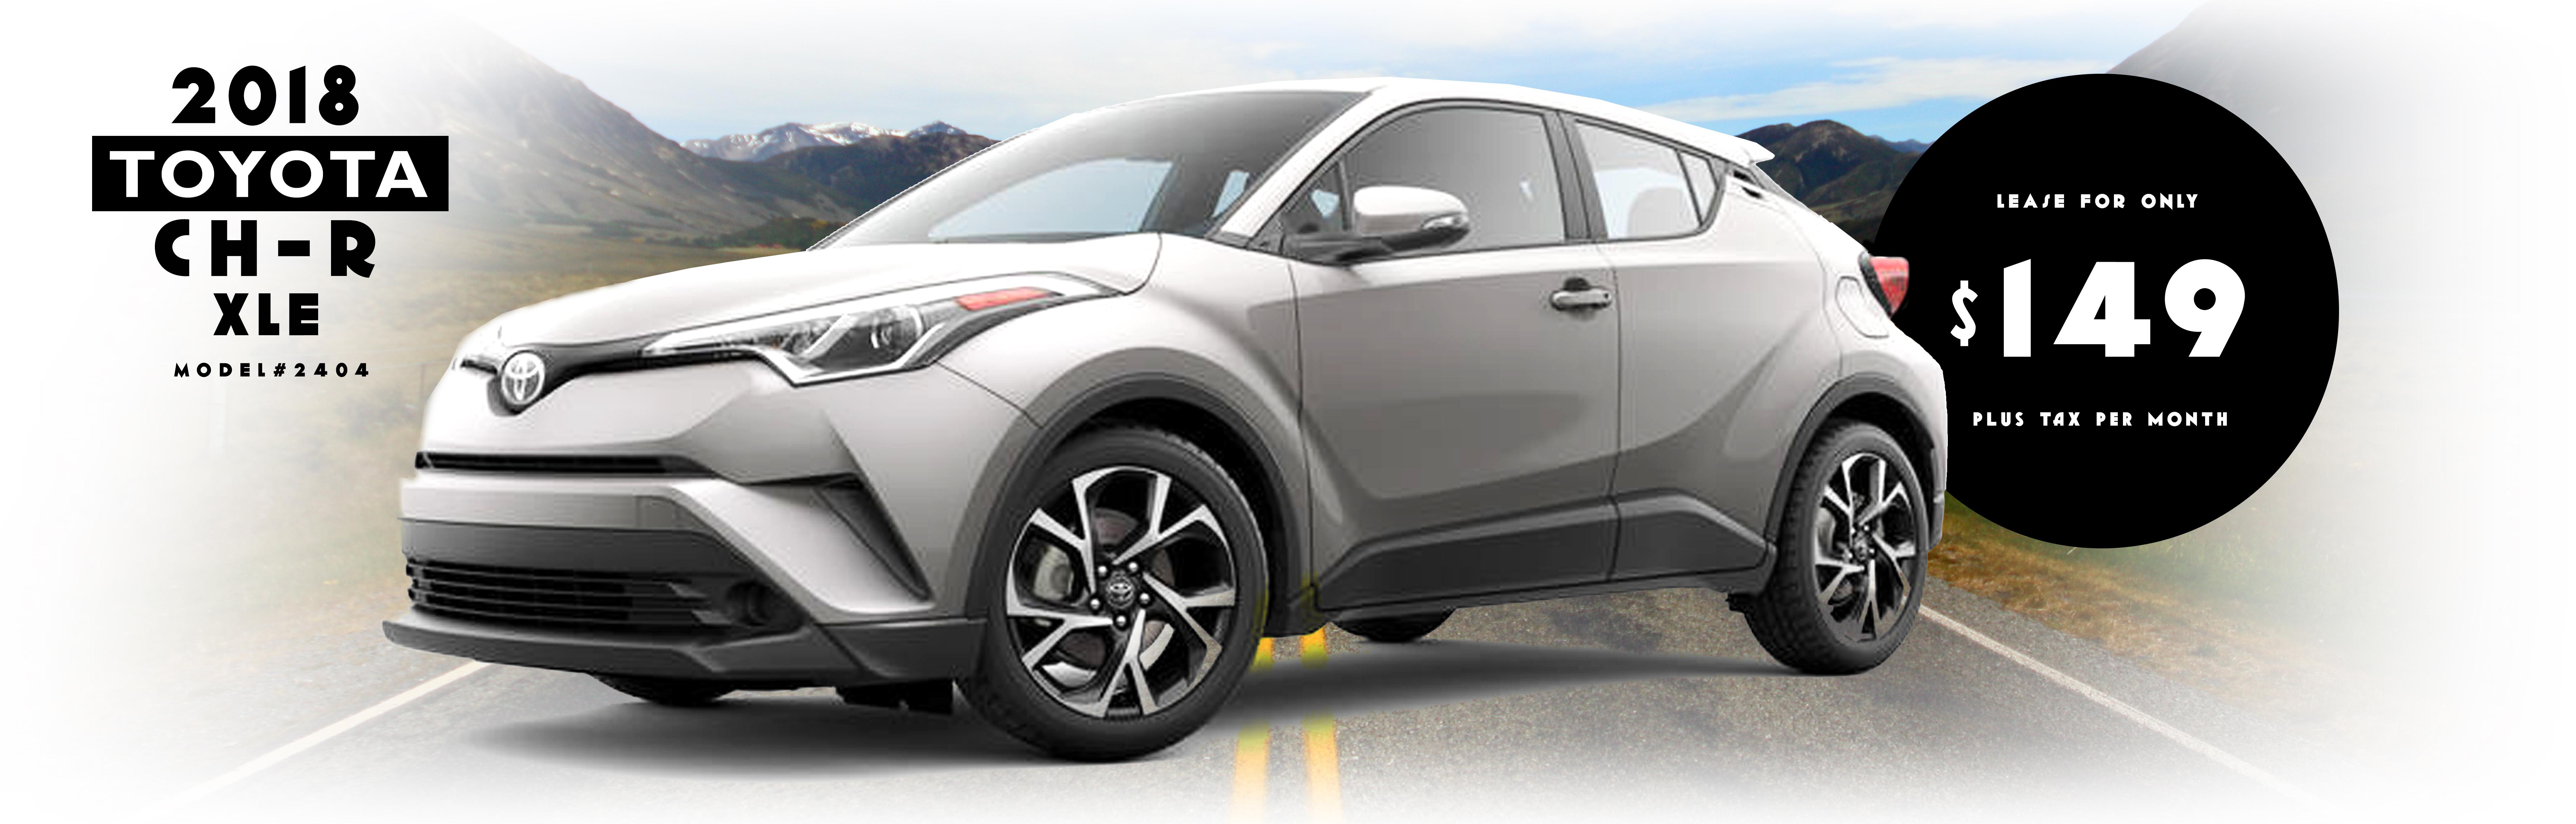 Santa Margarita Toyota New & Used Car Dealership Orange County CA